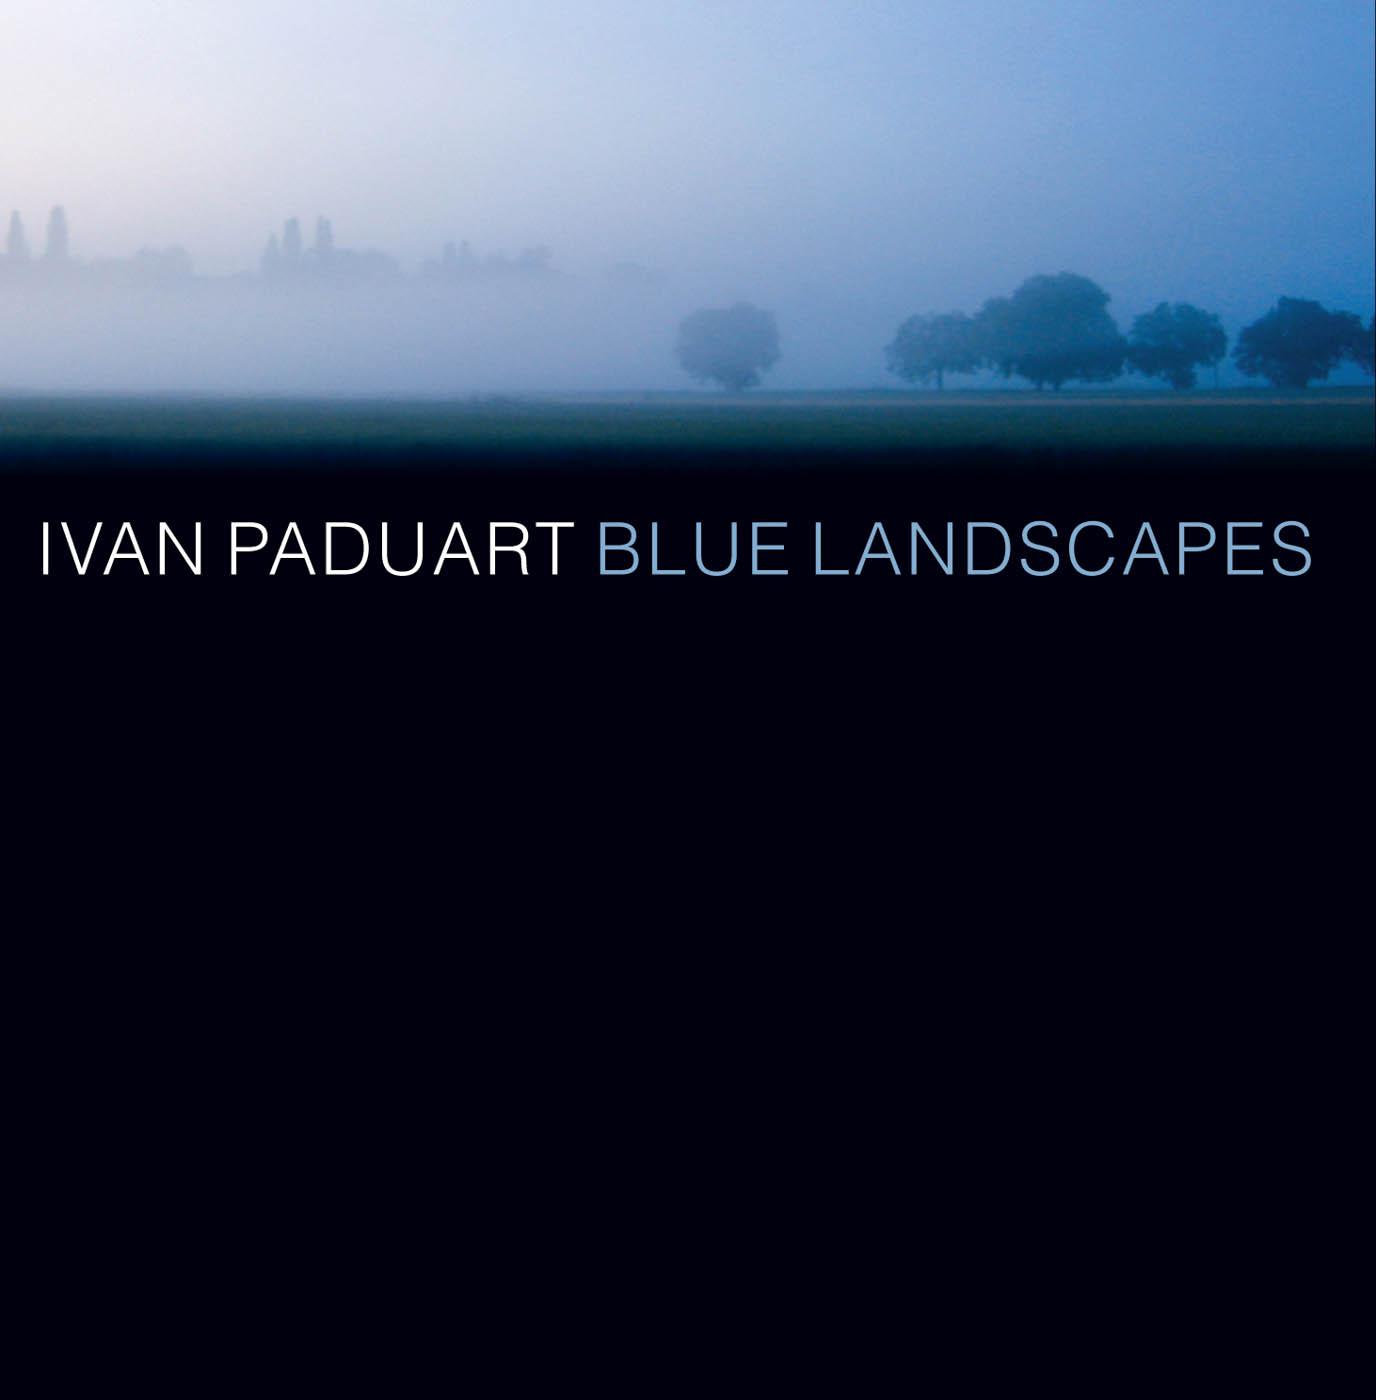 Ivan-Paduart-2-Booklet-2010-10-12-II-1.jpg